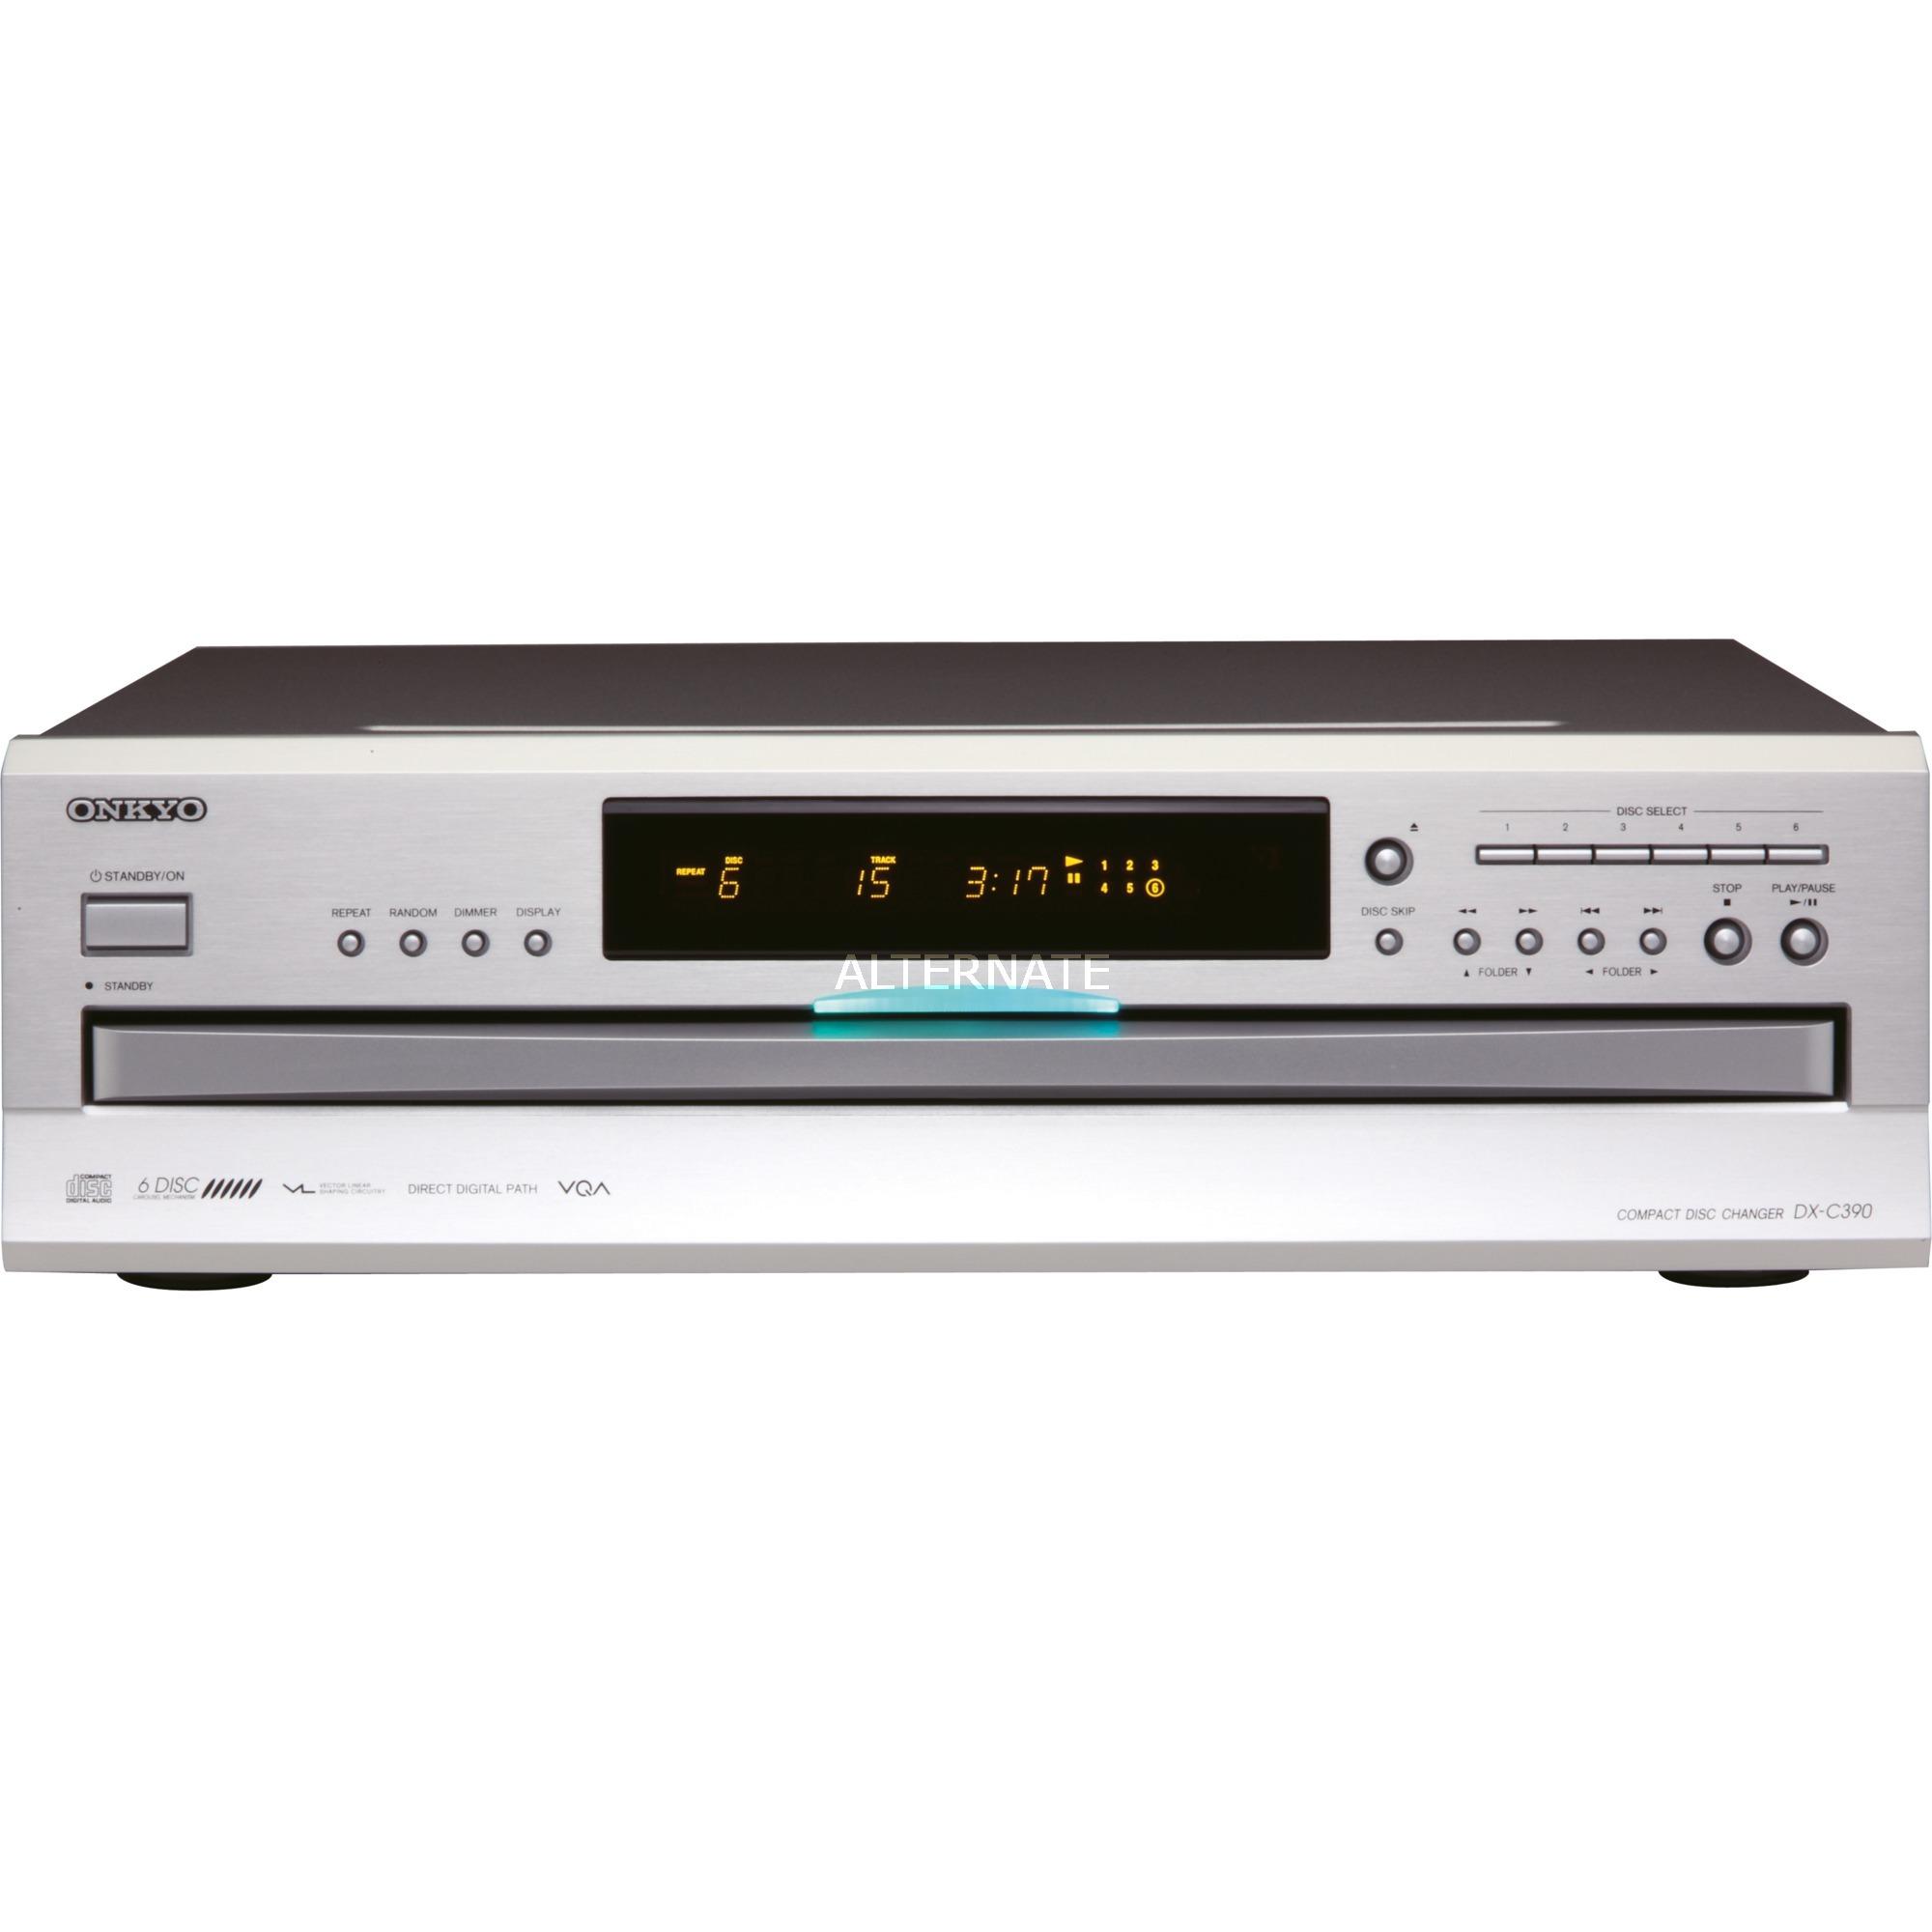 DX-C390 Portable CD player, Reproductor de CD